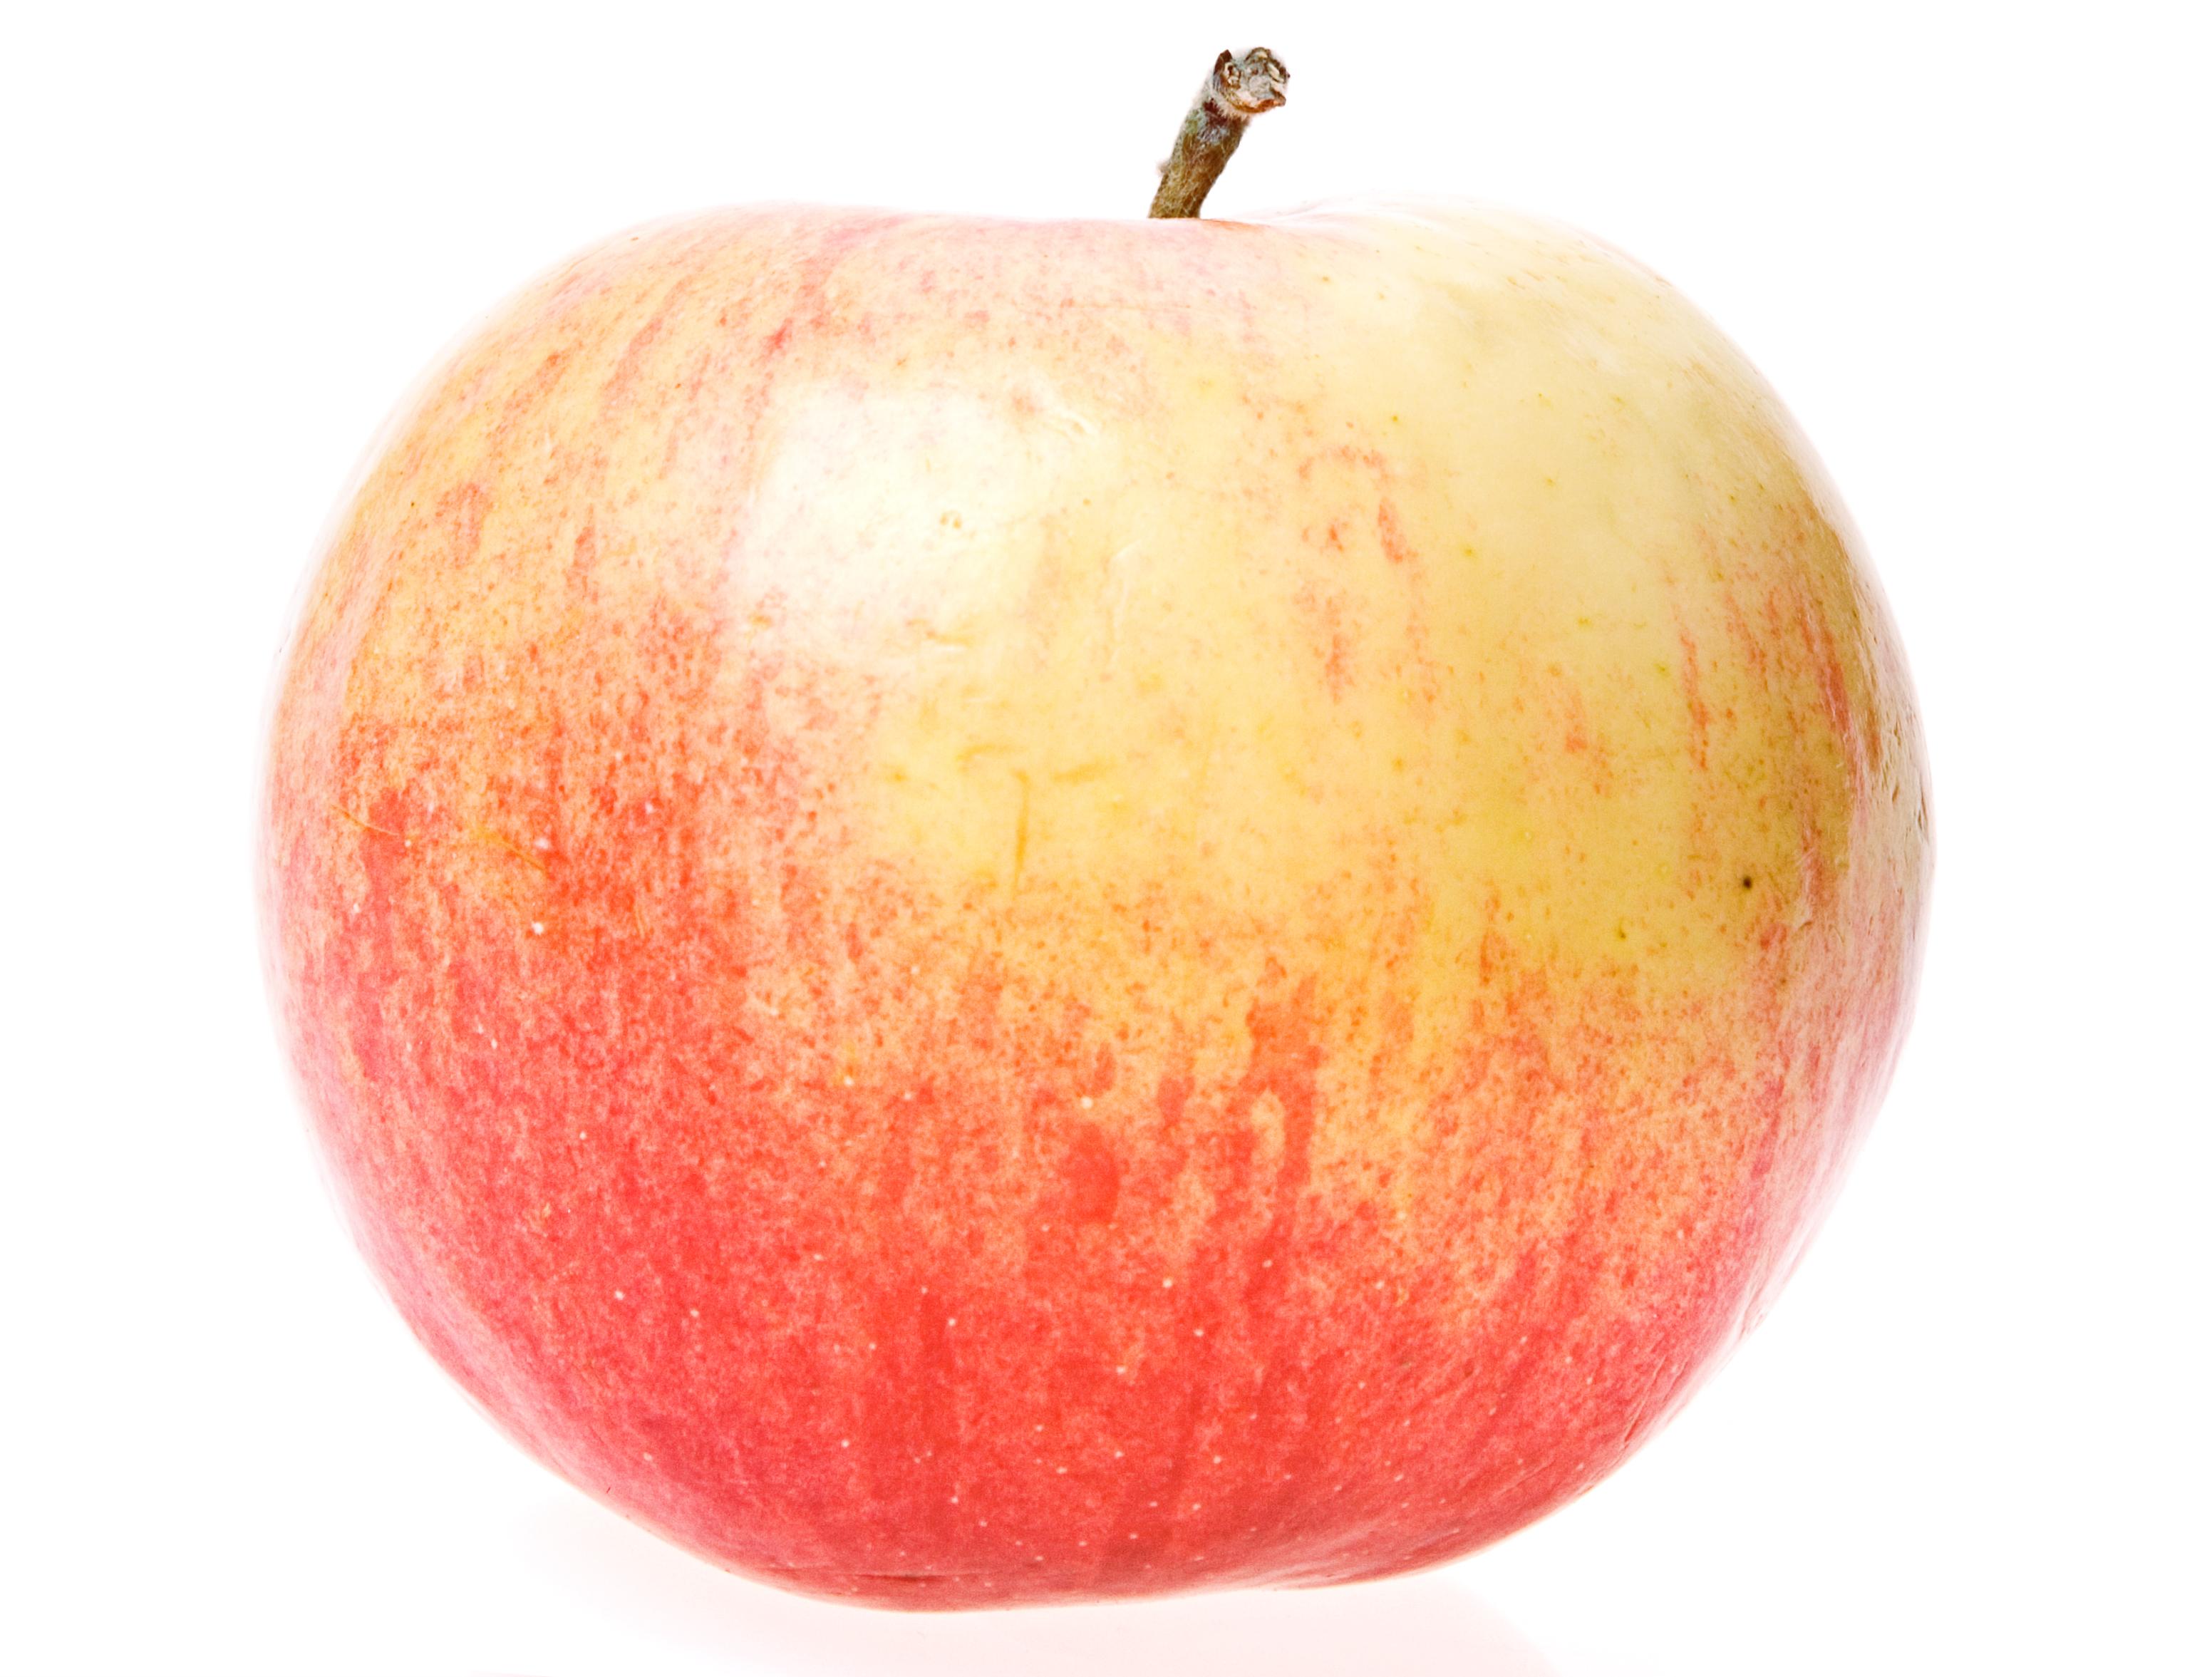 apple, One, Vitamin, Vegetarian, Tasteful, HQ Photo